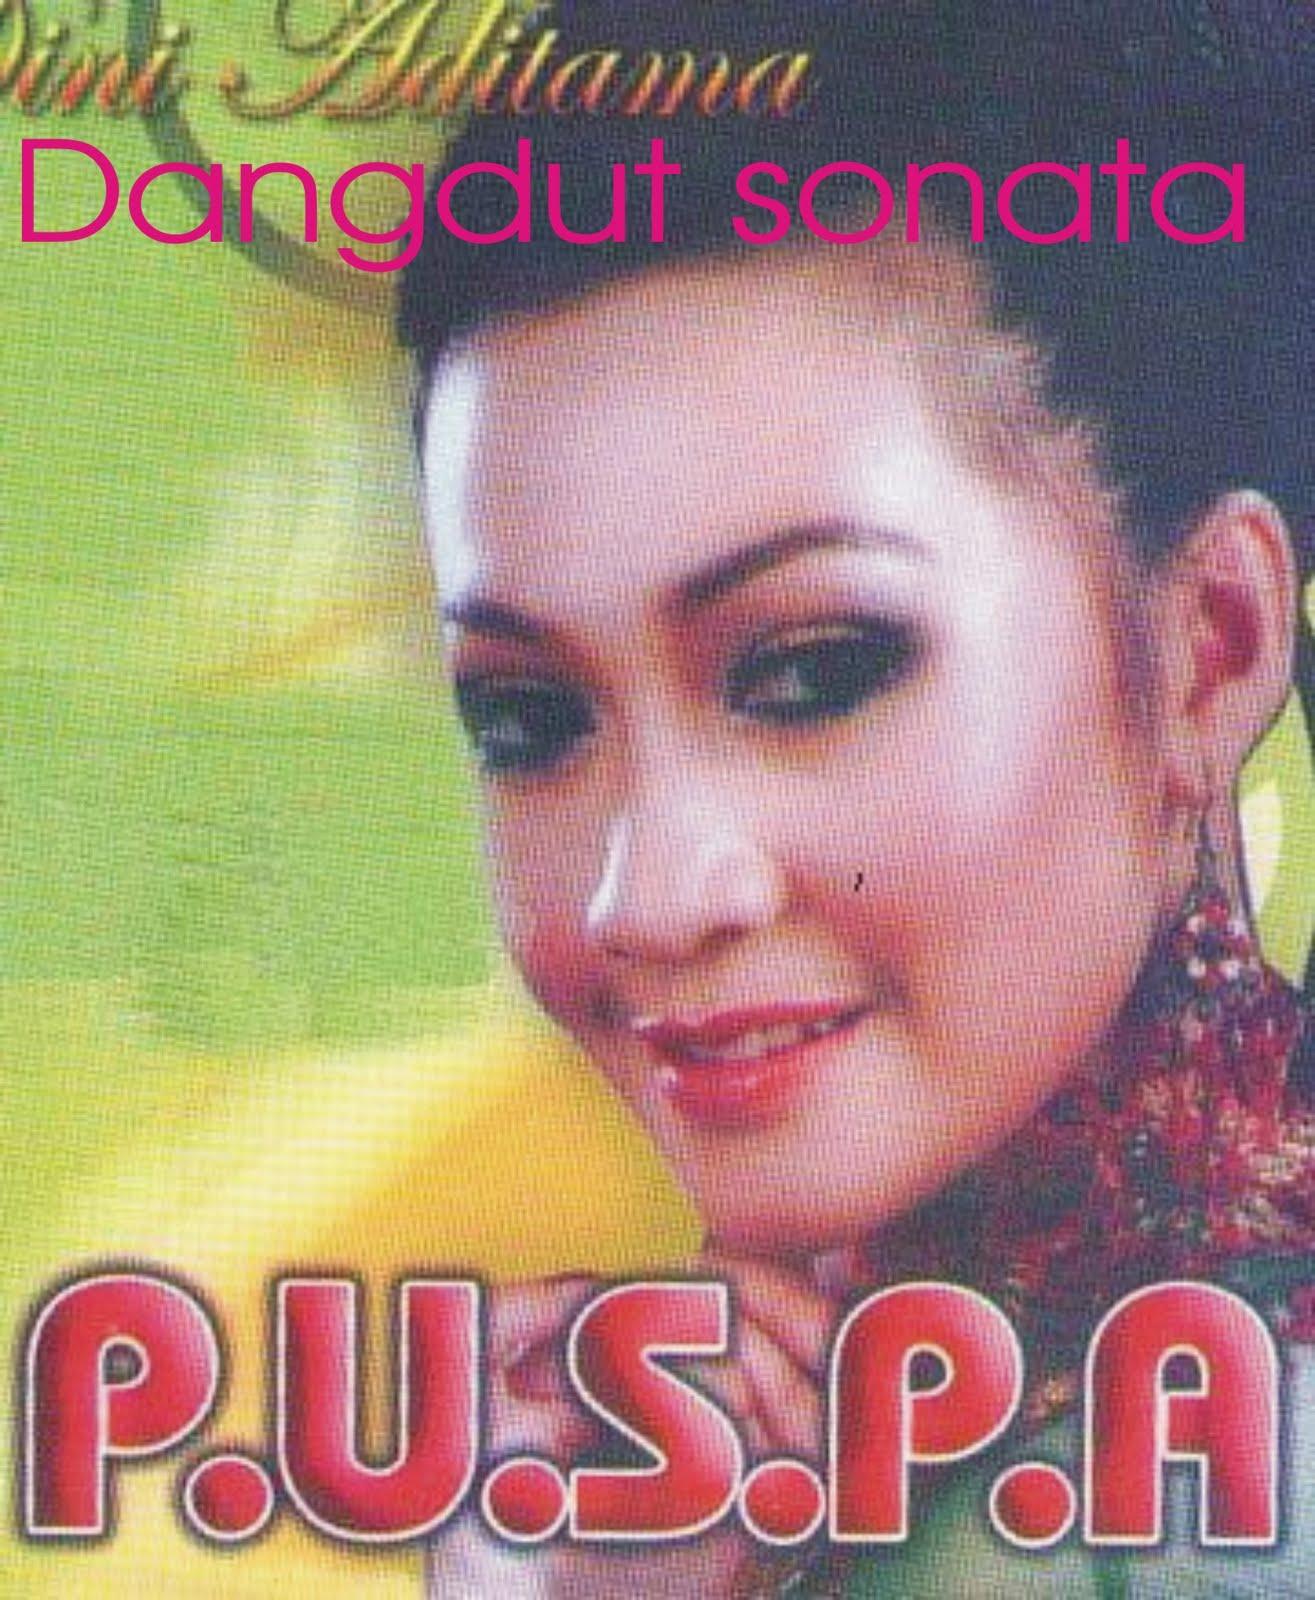 Download Lagu 4 20 Kita Pasti Tua: DANGDUT SIRFTUM: Mei 2010